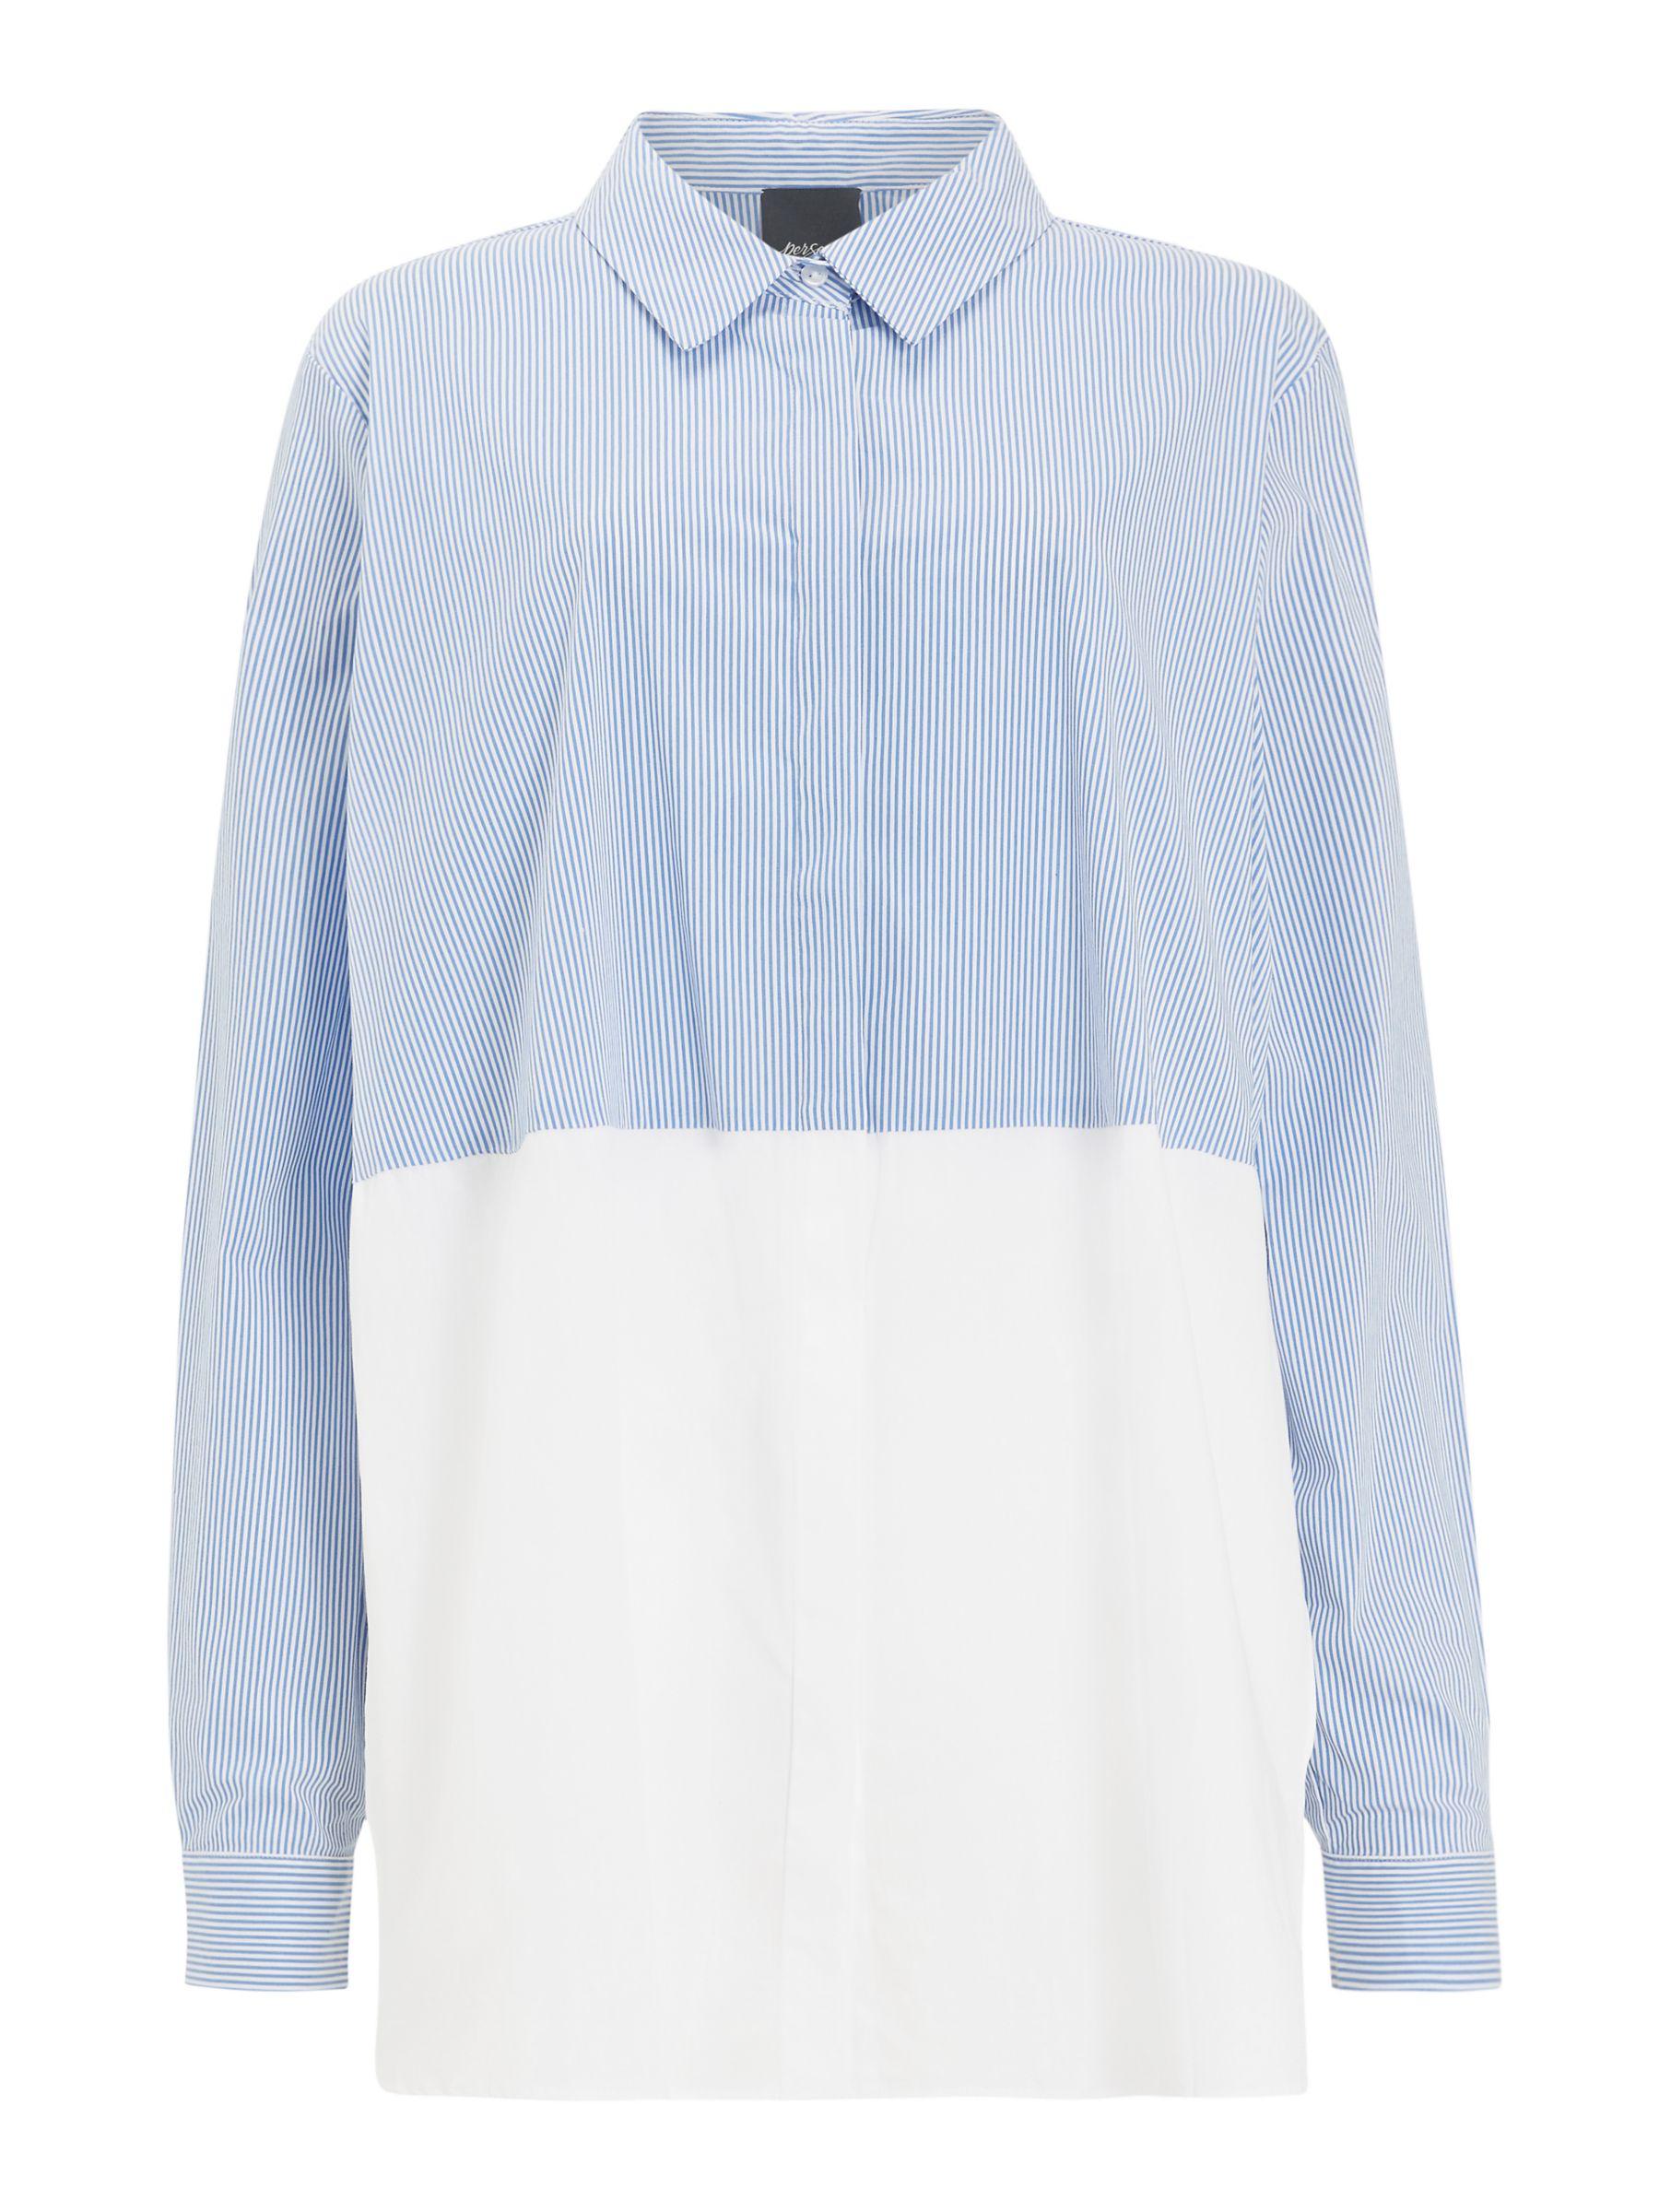 Persona by Marina Rinaldi Persona by Marina Rinaldi Balsa Stripe Shirt, White/Blue